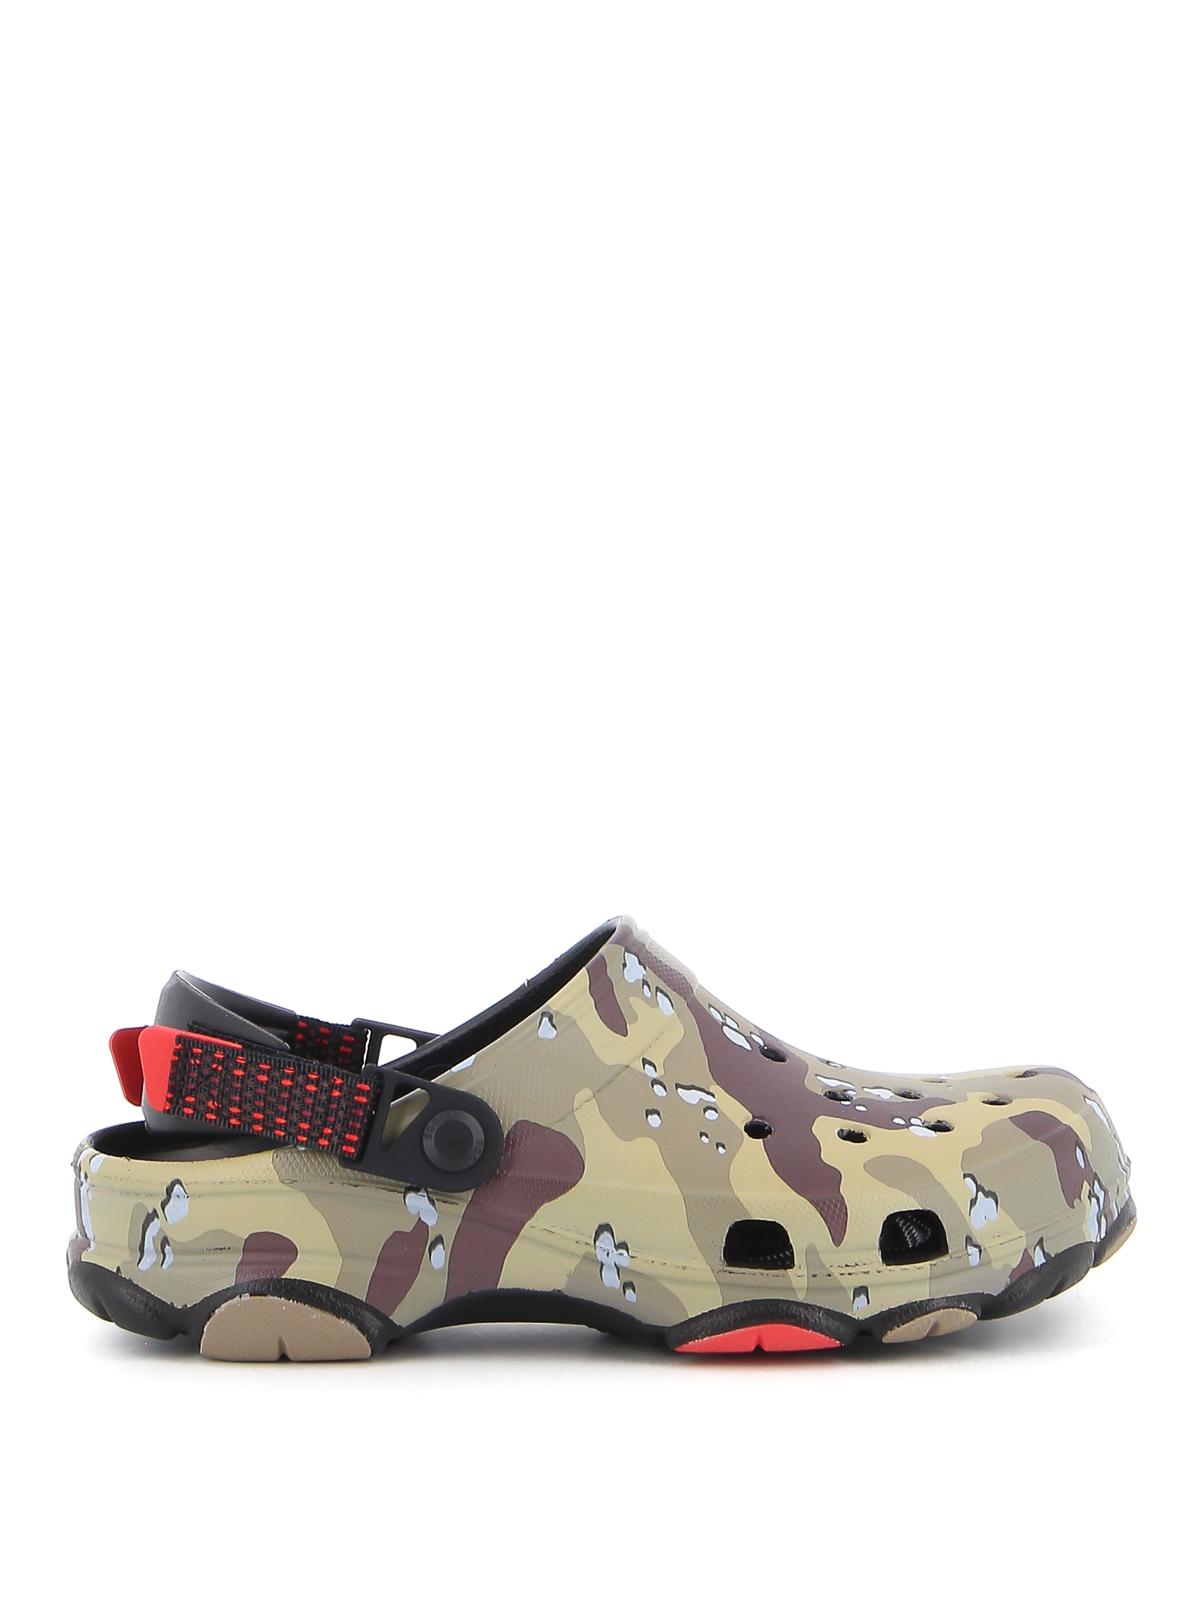 Picture of Crocs | Cls All Terrain Desert Camo M